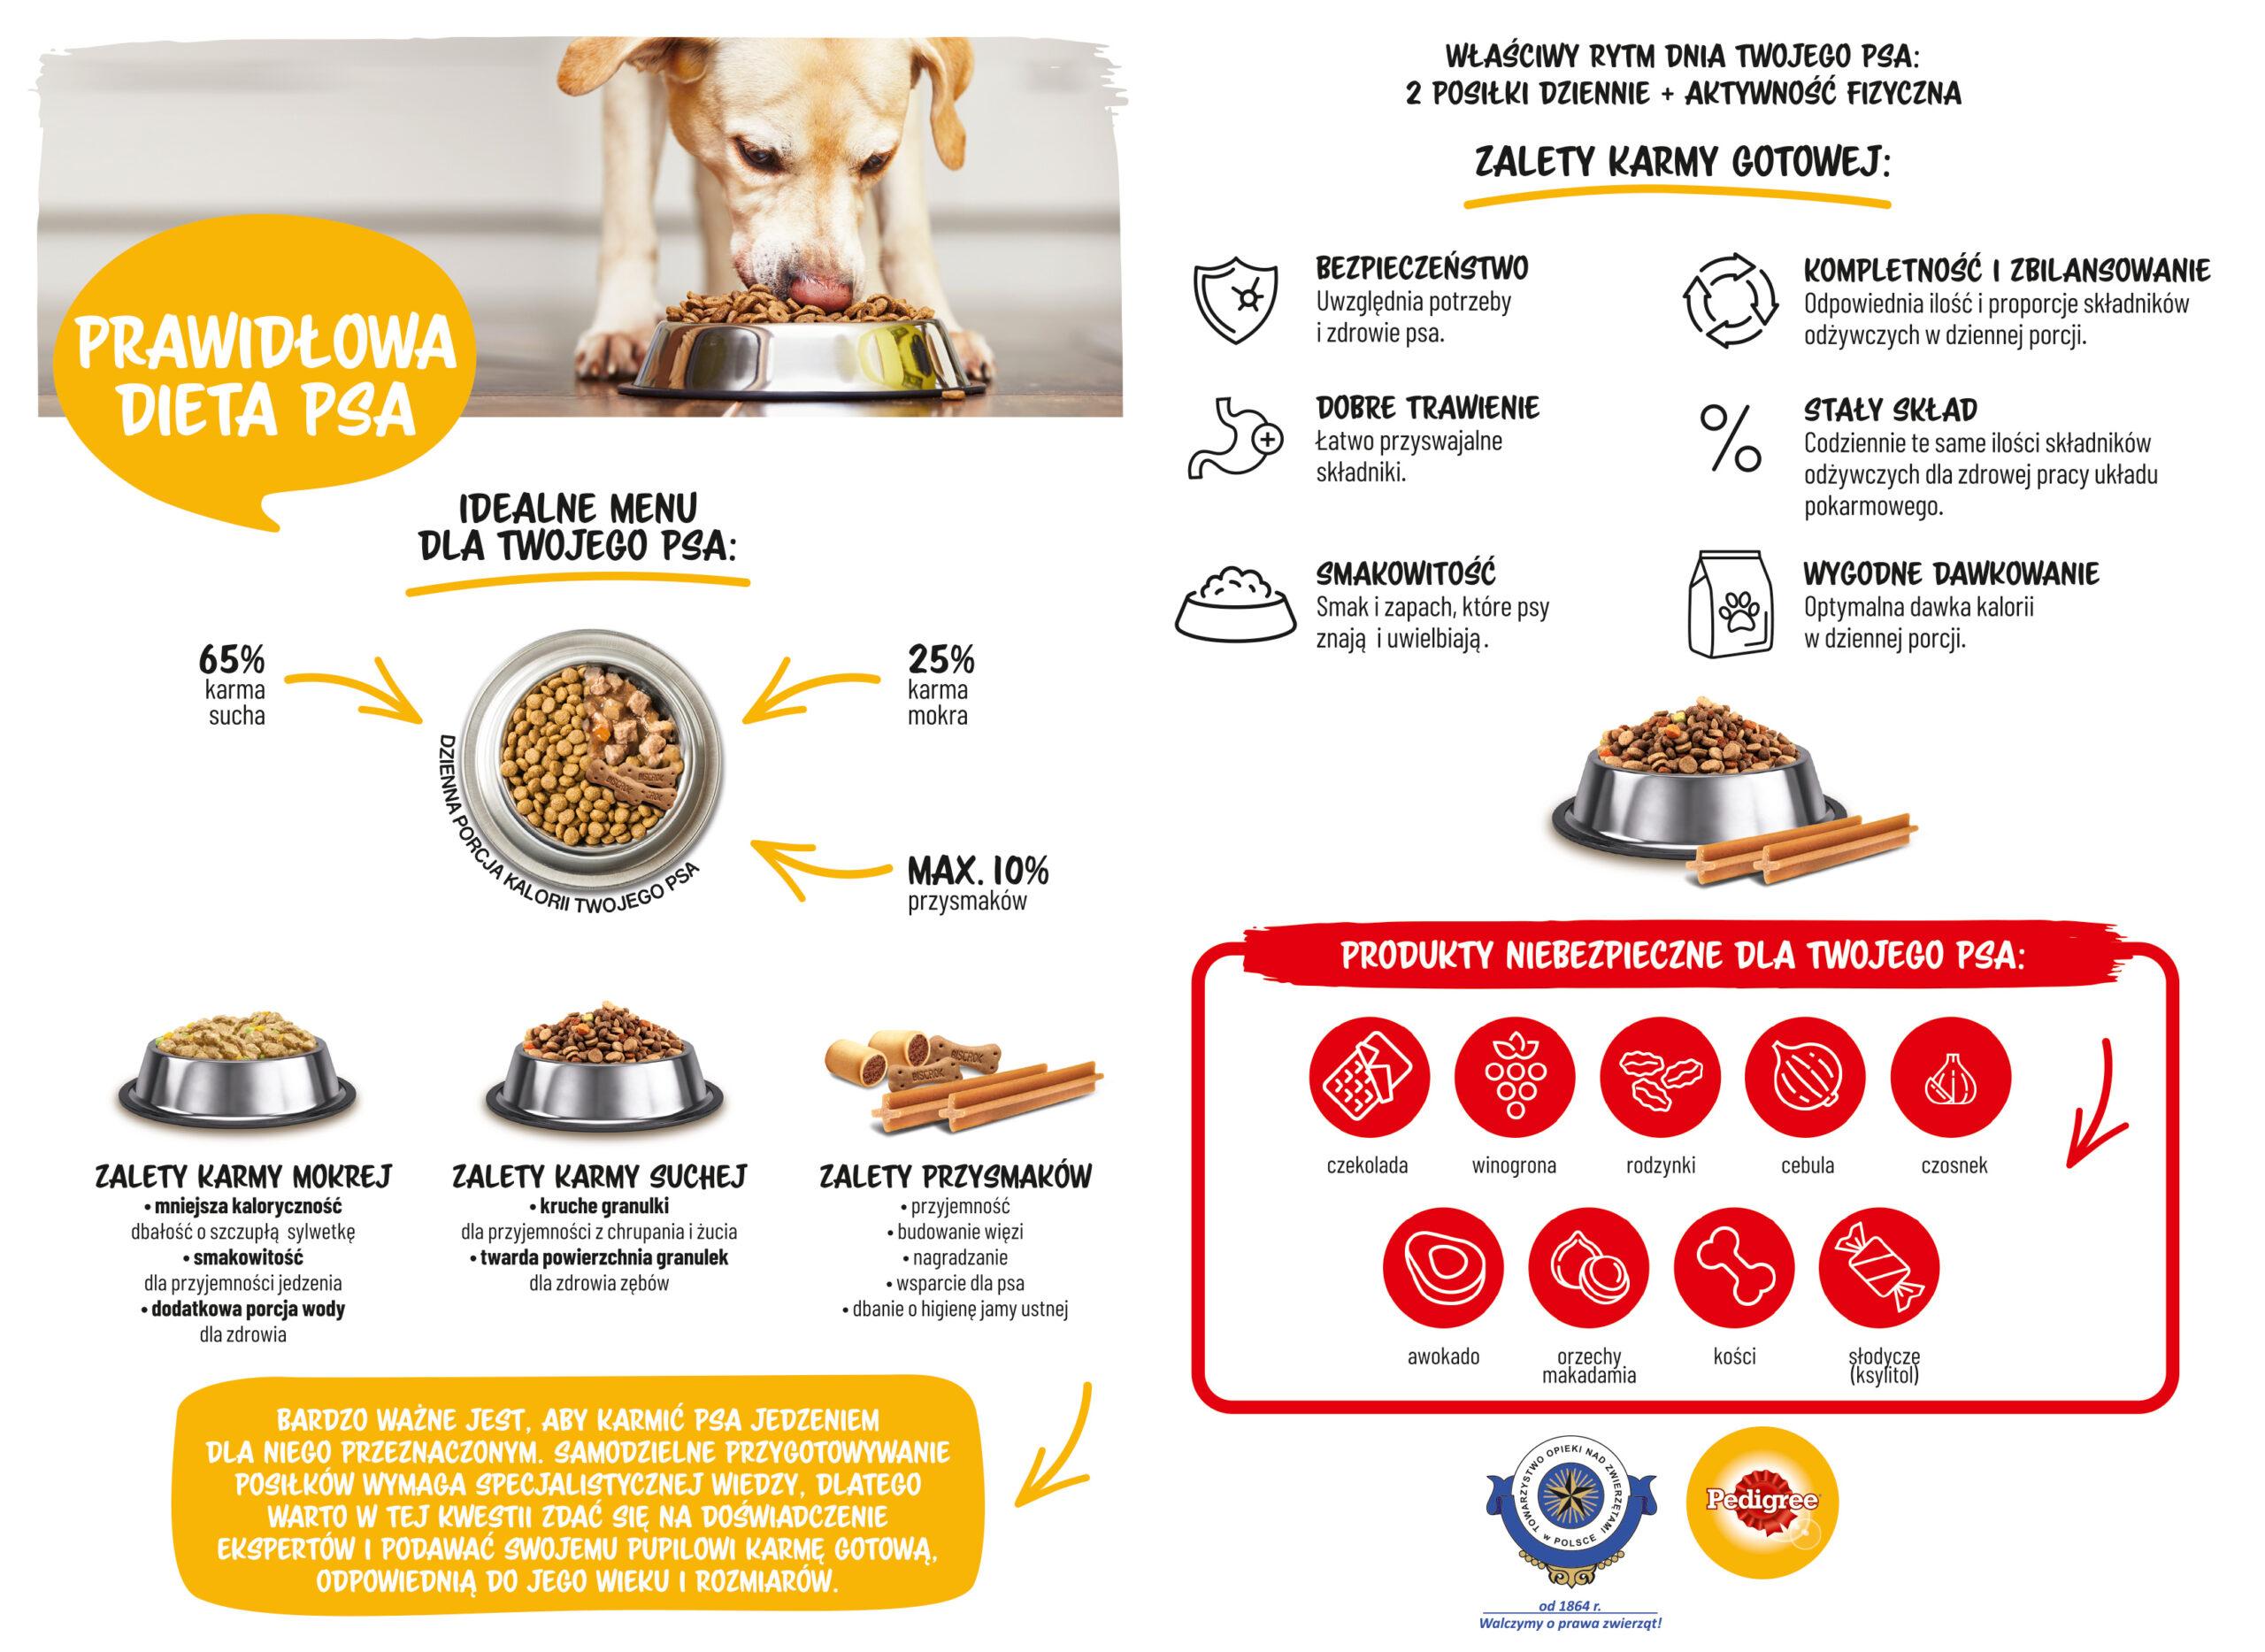 Prawidłowa dieta psa